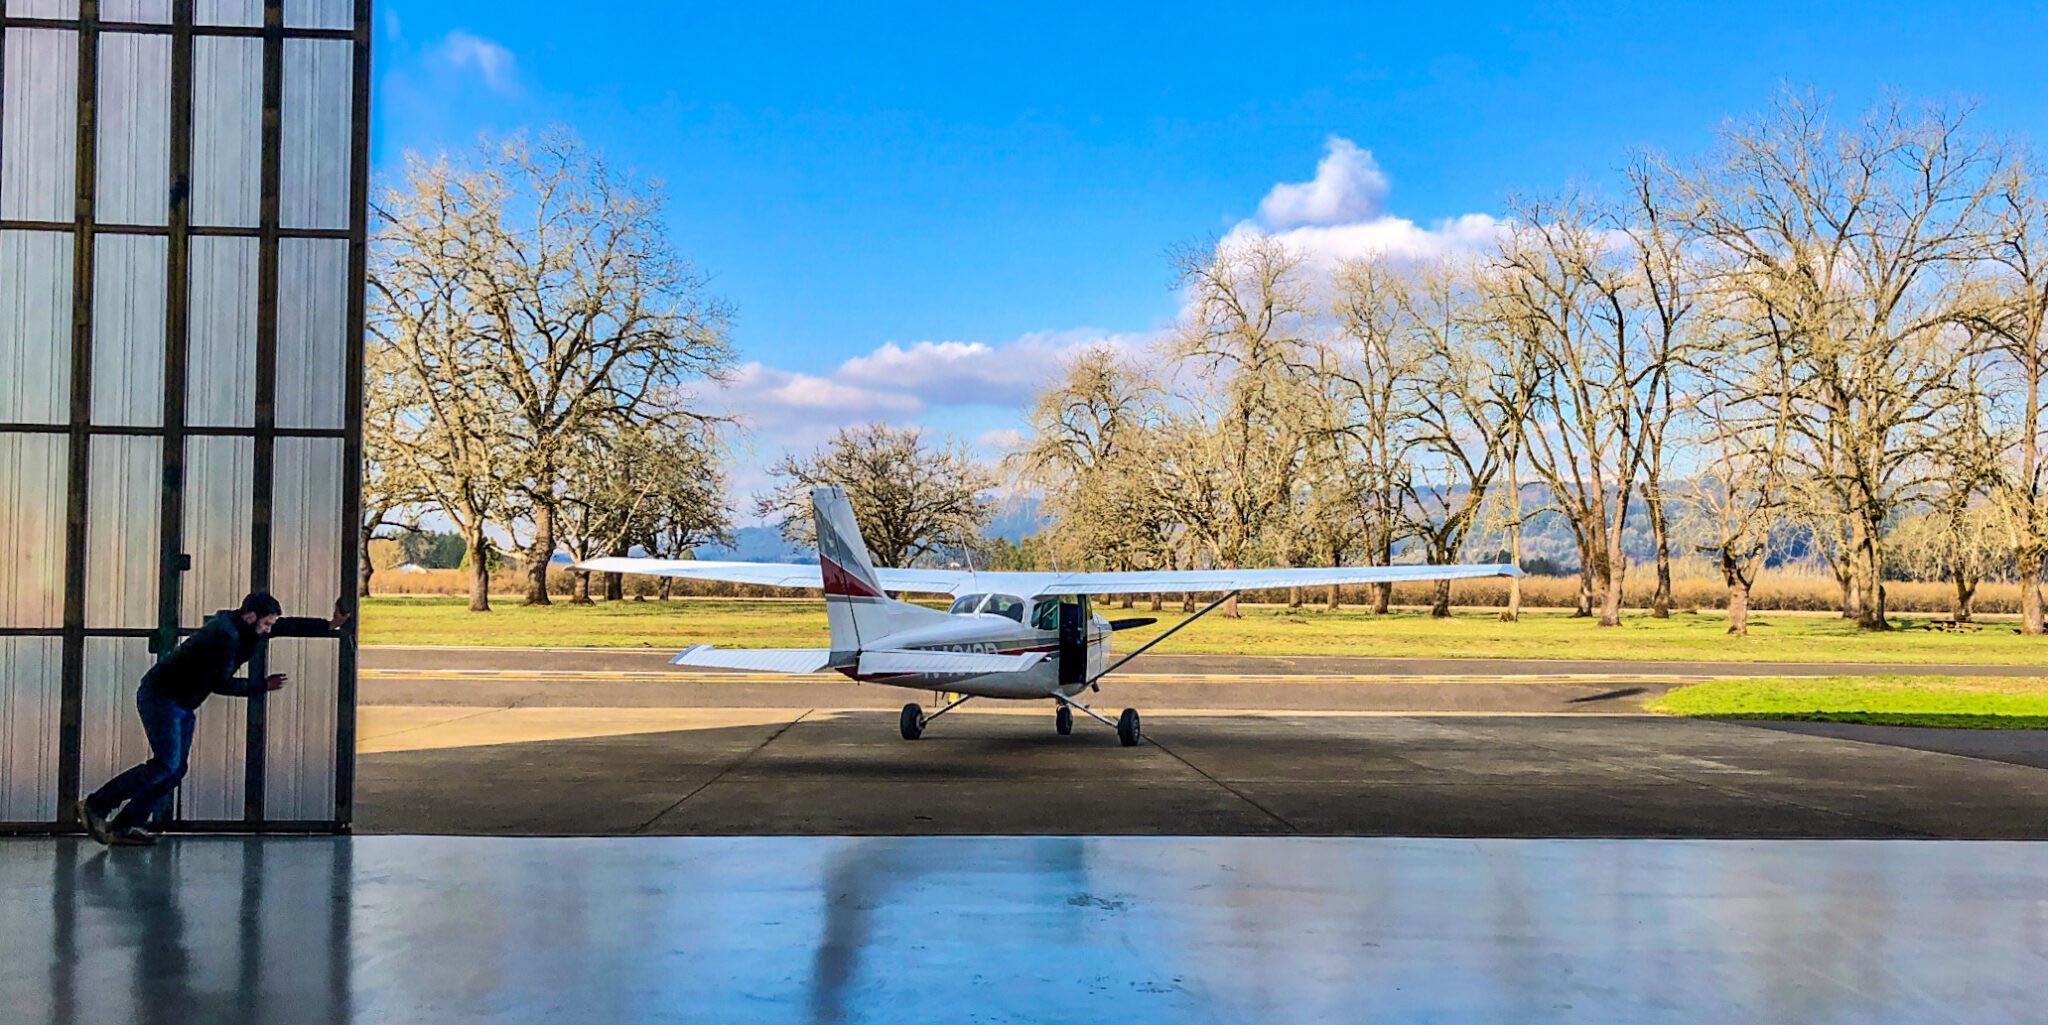 Plane leaving hangar for student pilot training at Precision Aviation